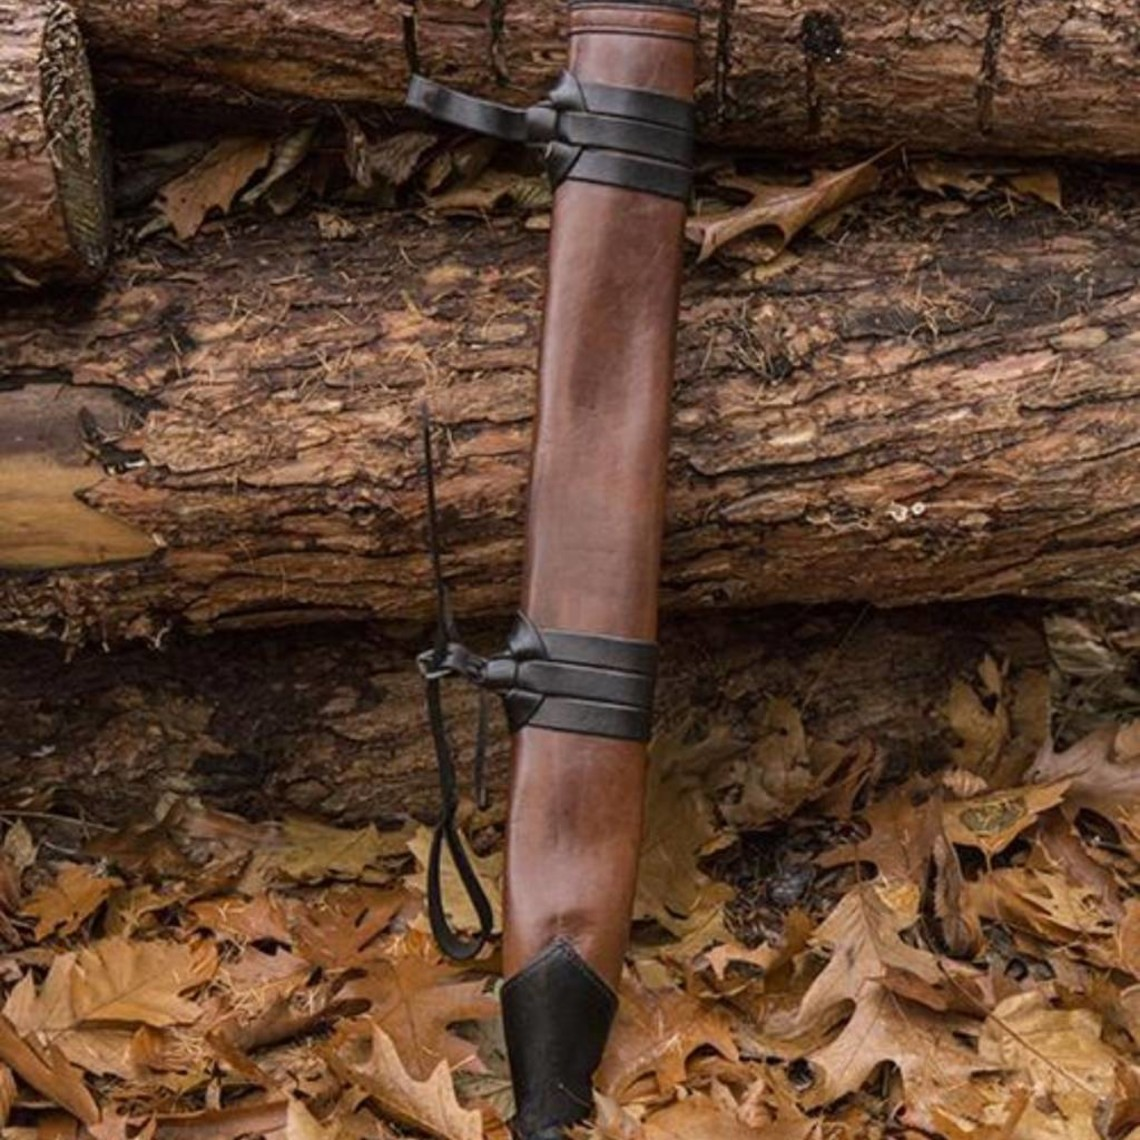 Epic Armoury LARP Vaina espada para zurdos, medio, cuero